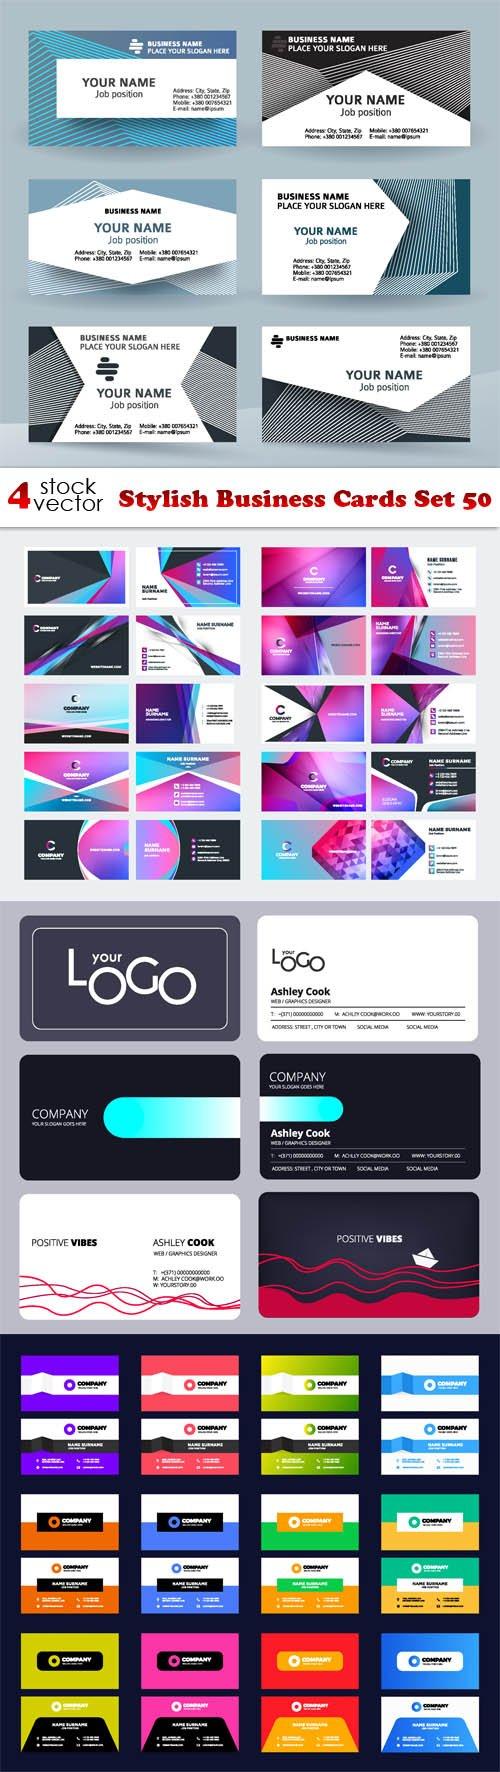 Vectors - Stylish Business Cards Set 50